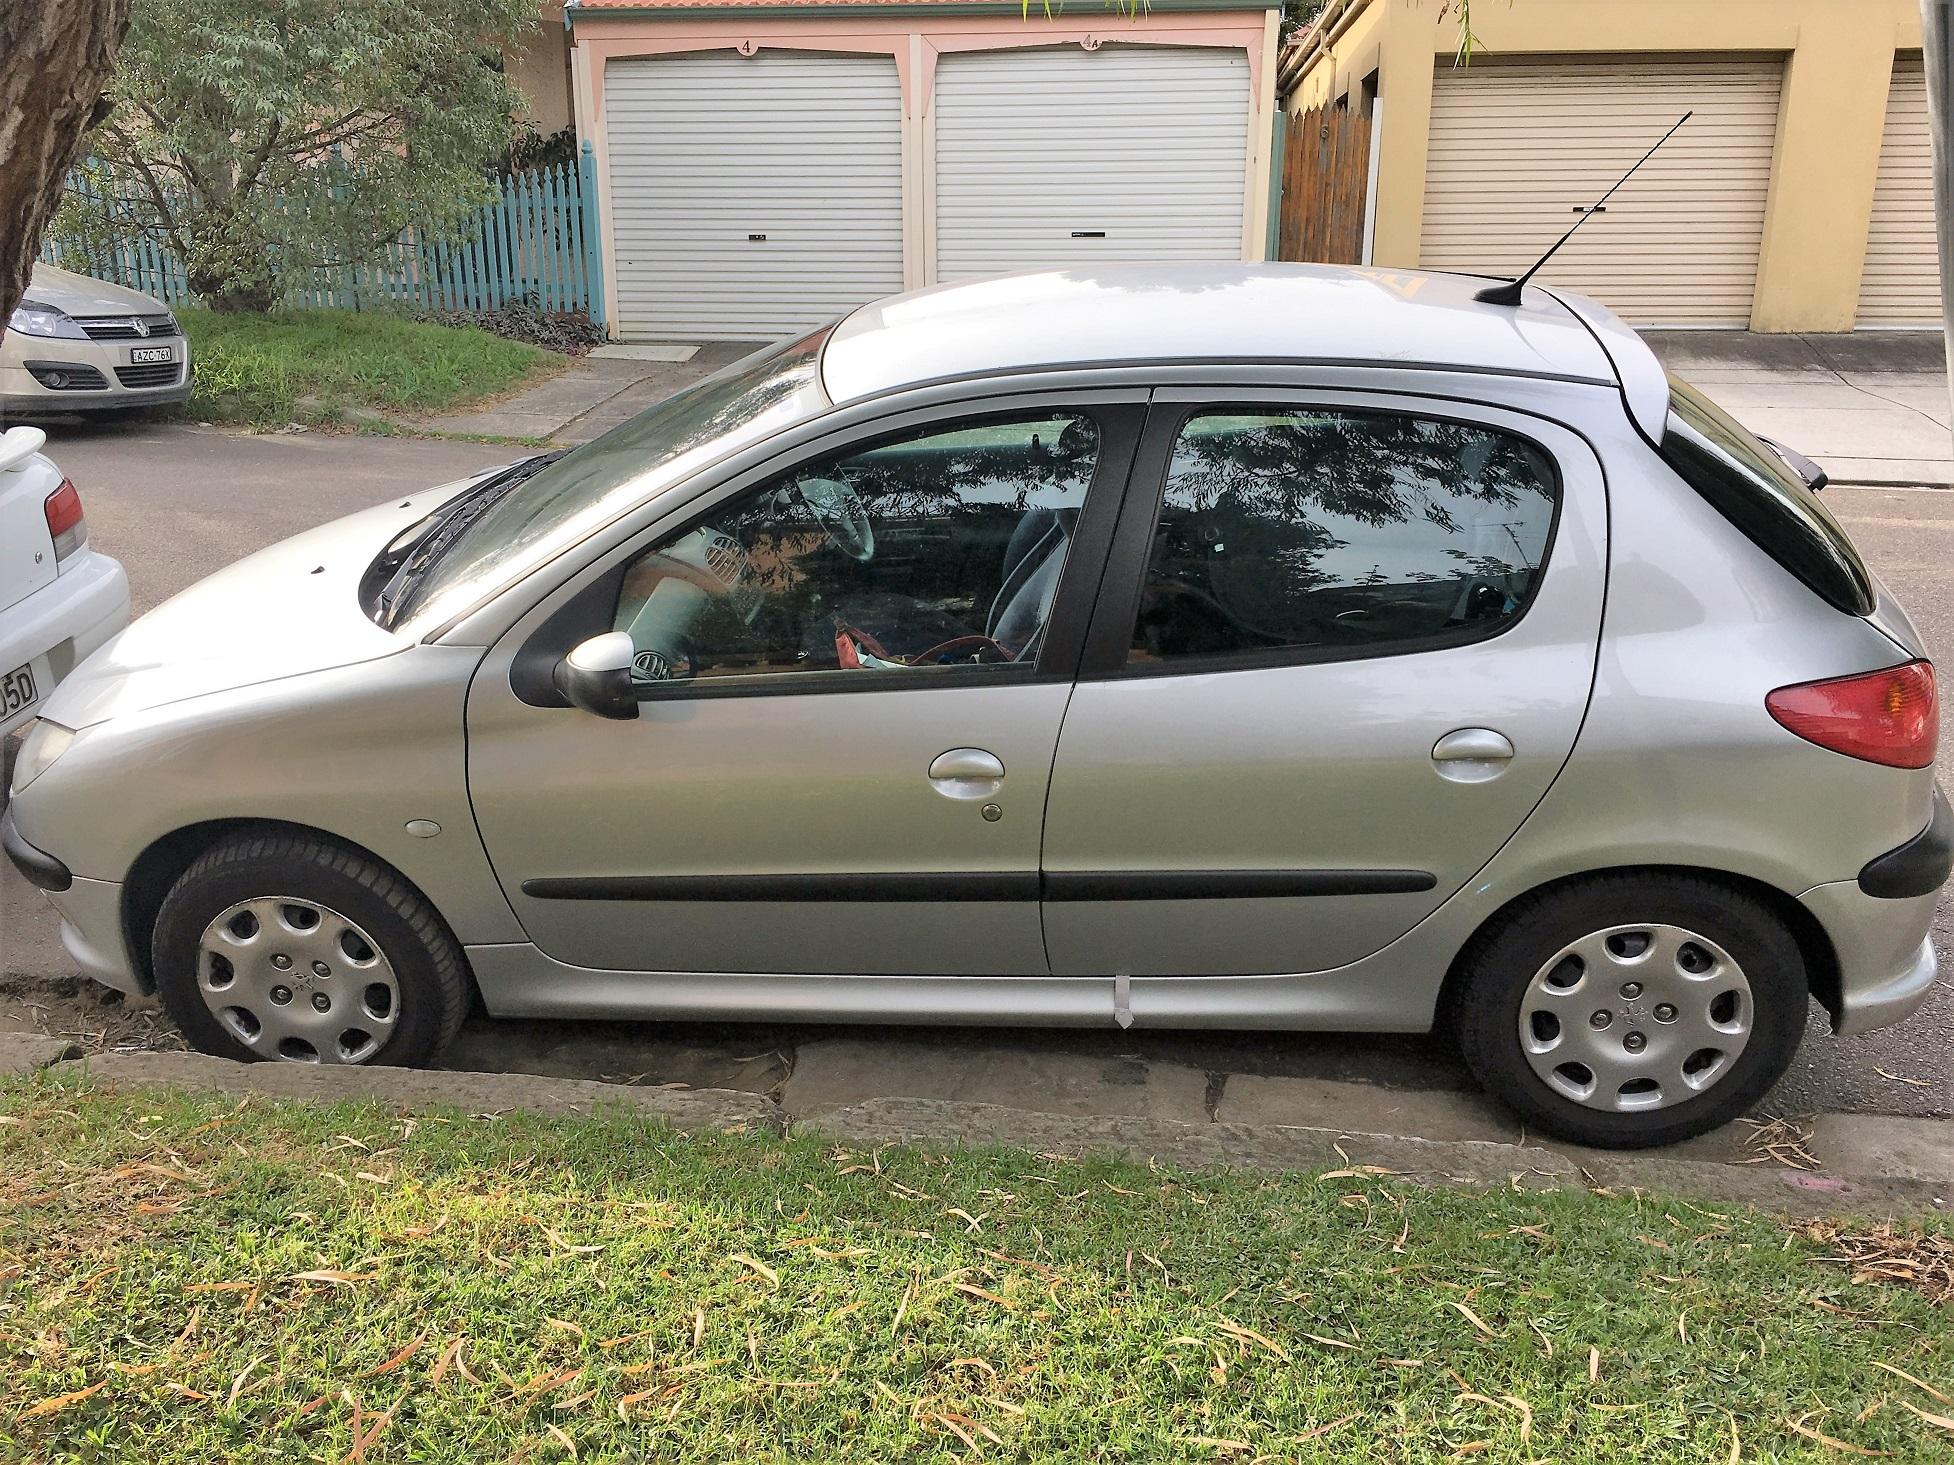 Picture of Natalia's 2005 Peugeot 206